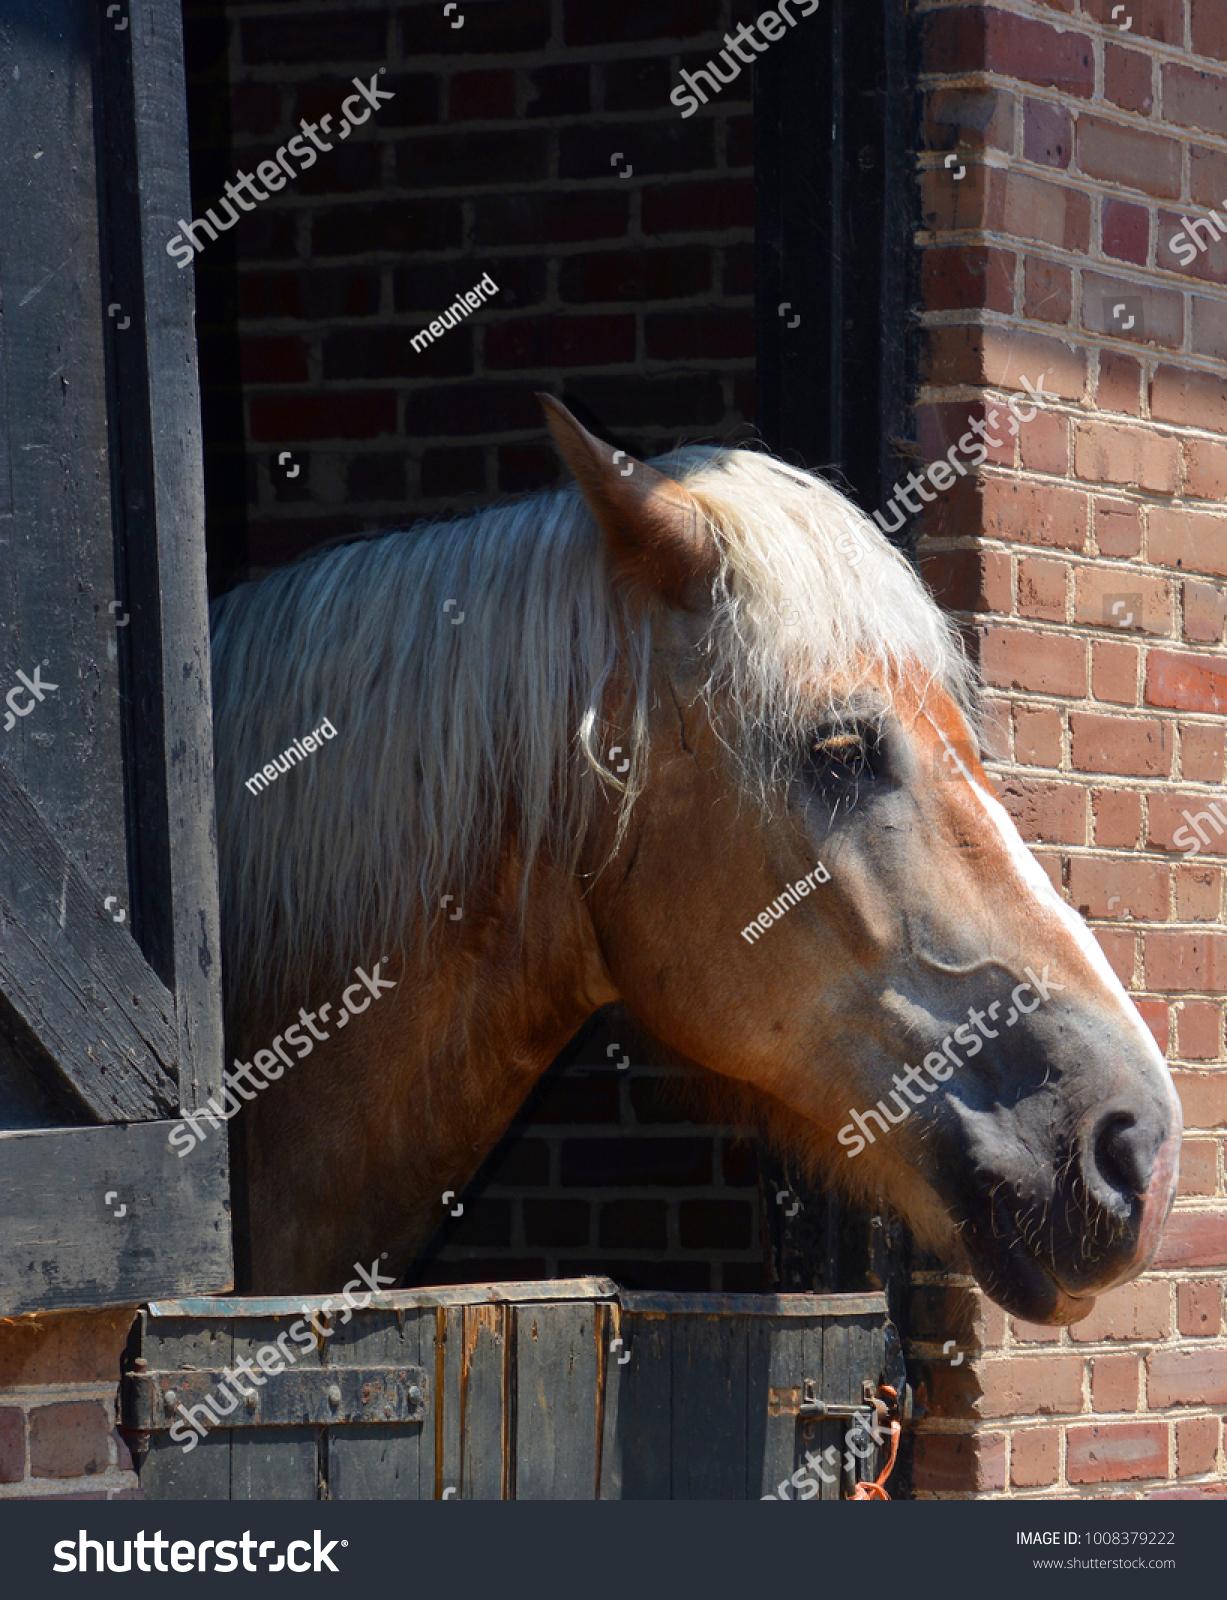 Percheron Breed Draft Horse That Originated Stock Photo Edit Now 1008379222